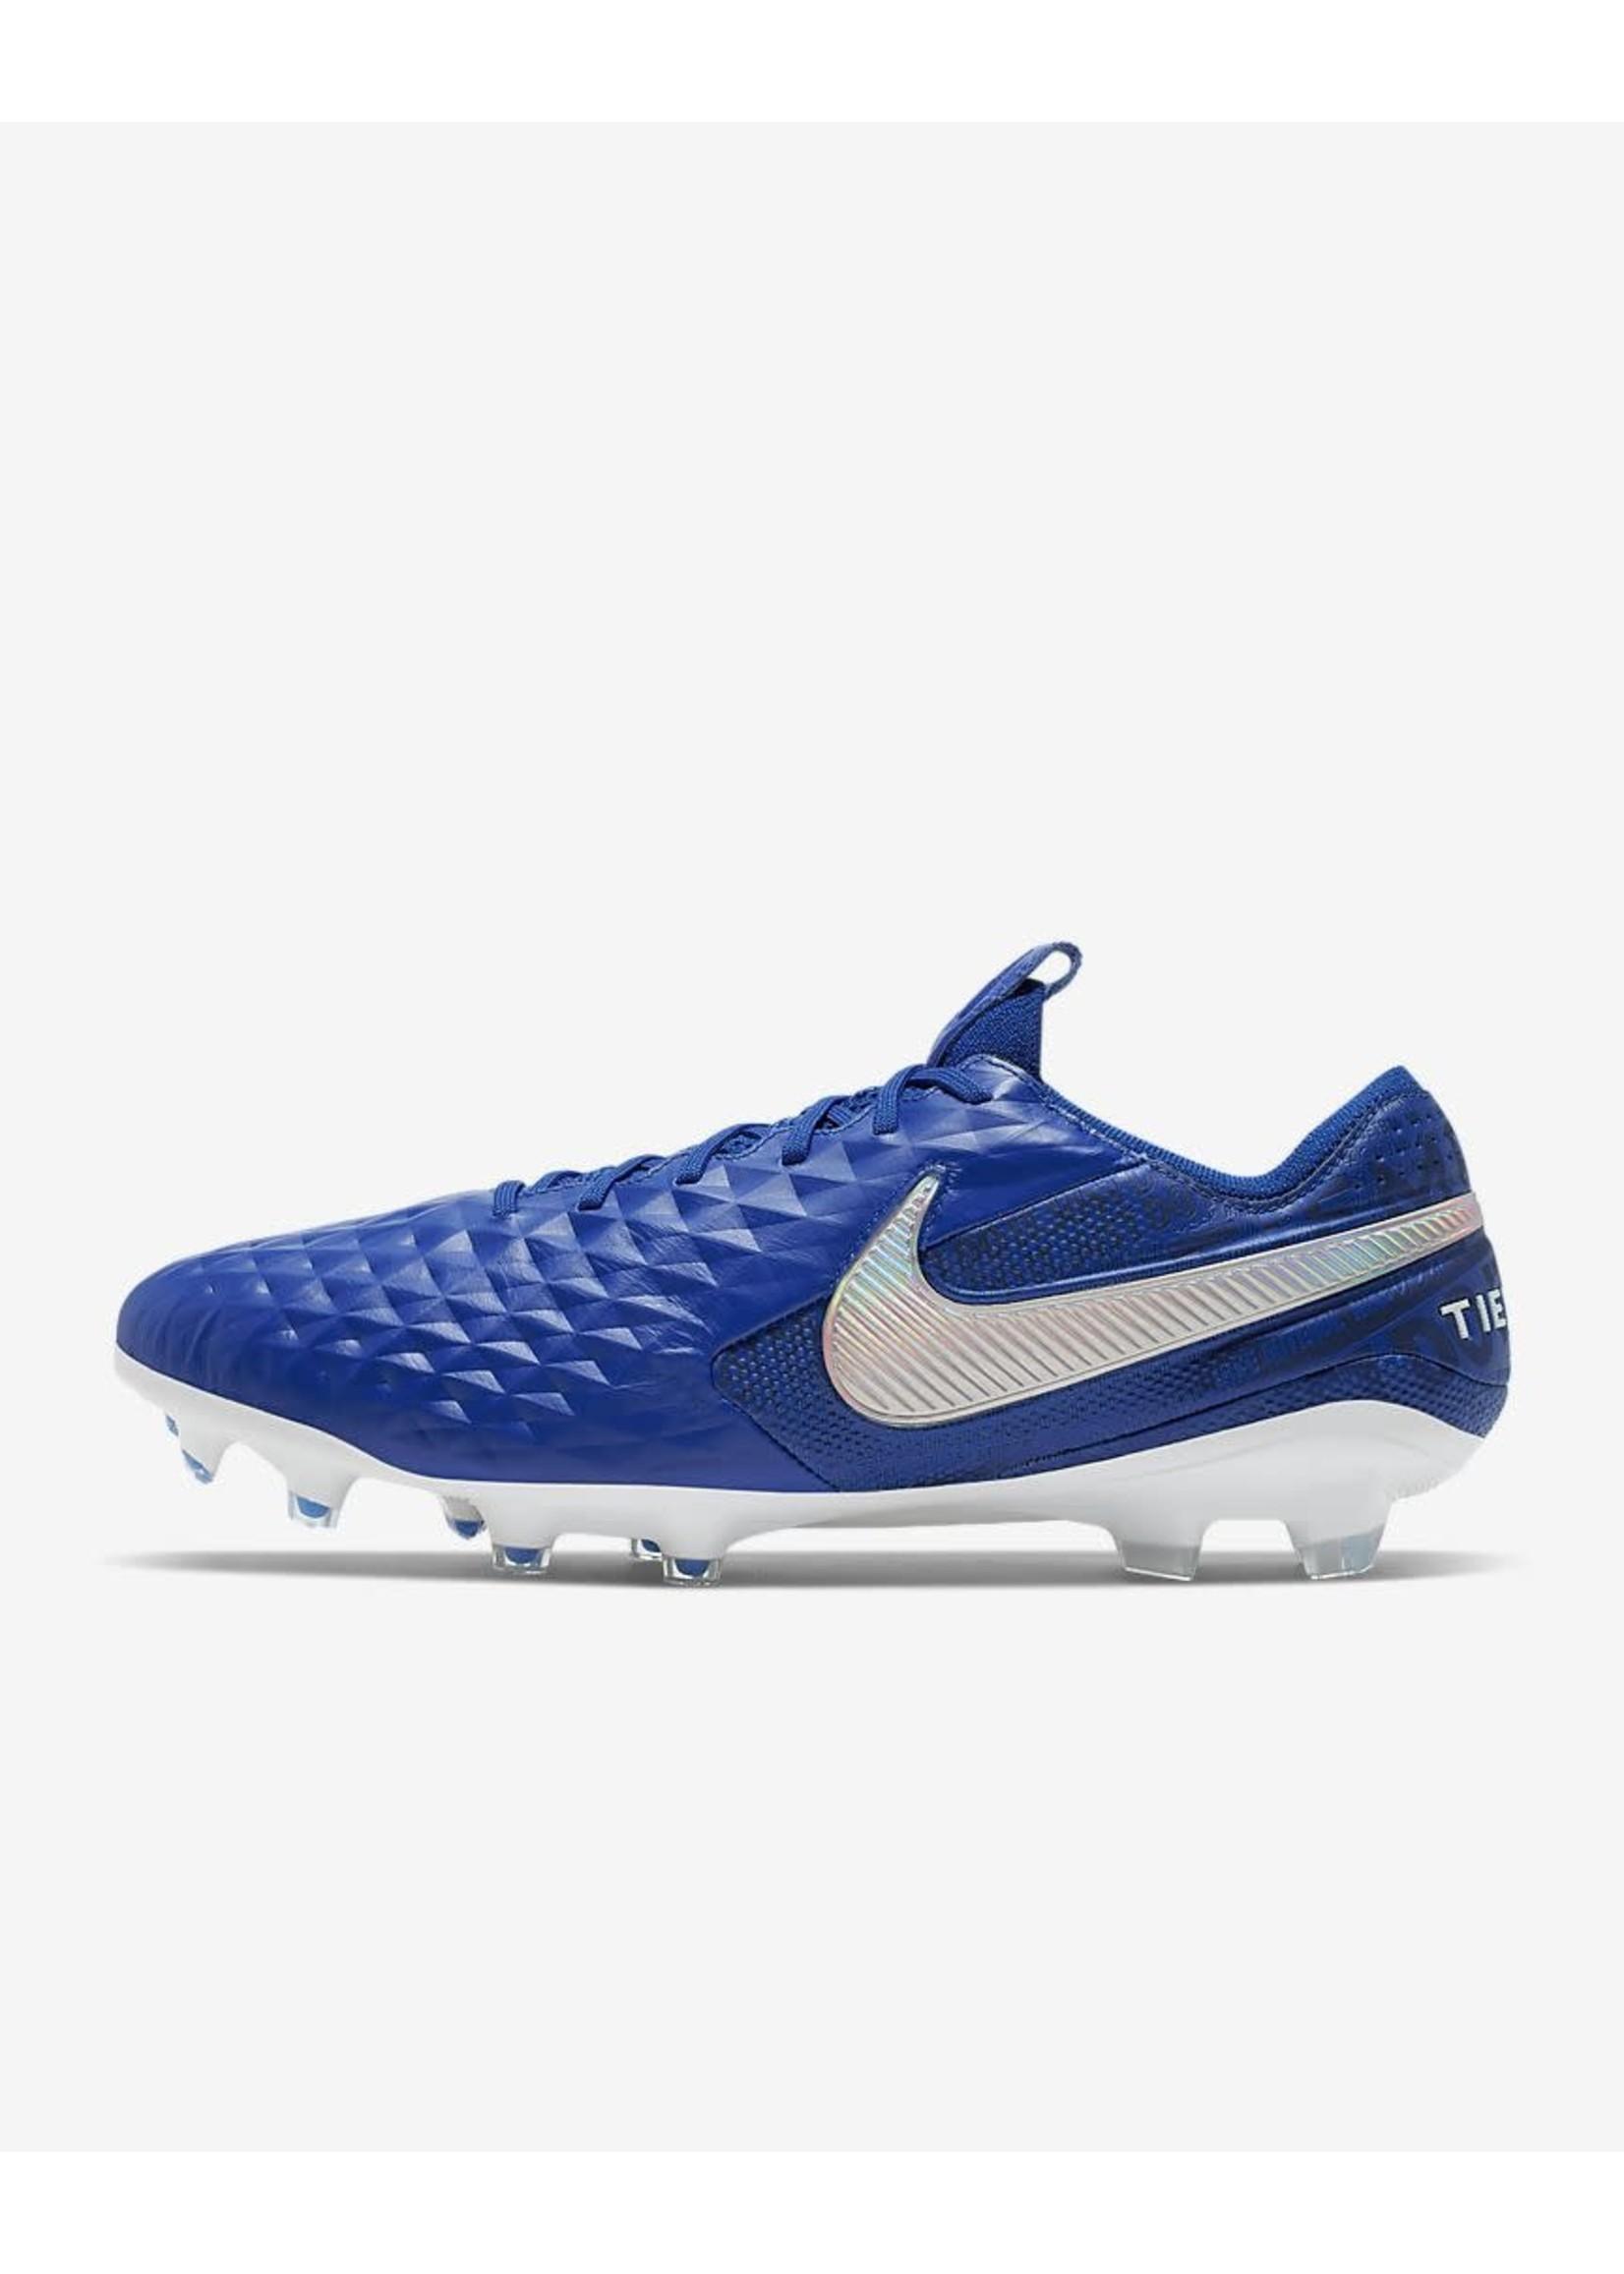 Nike Legend 8 Elite FG - Blue/White